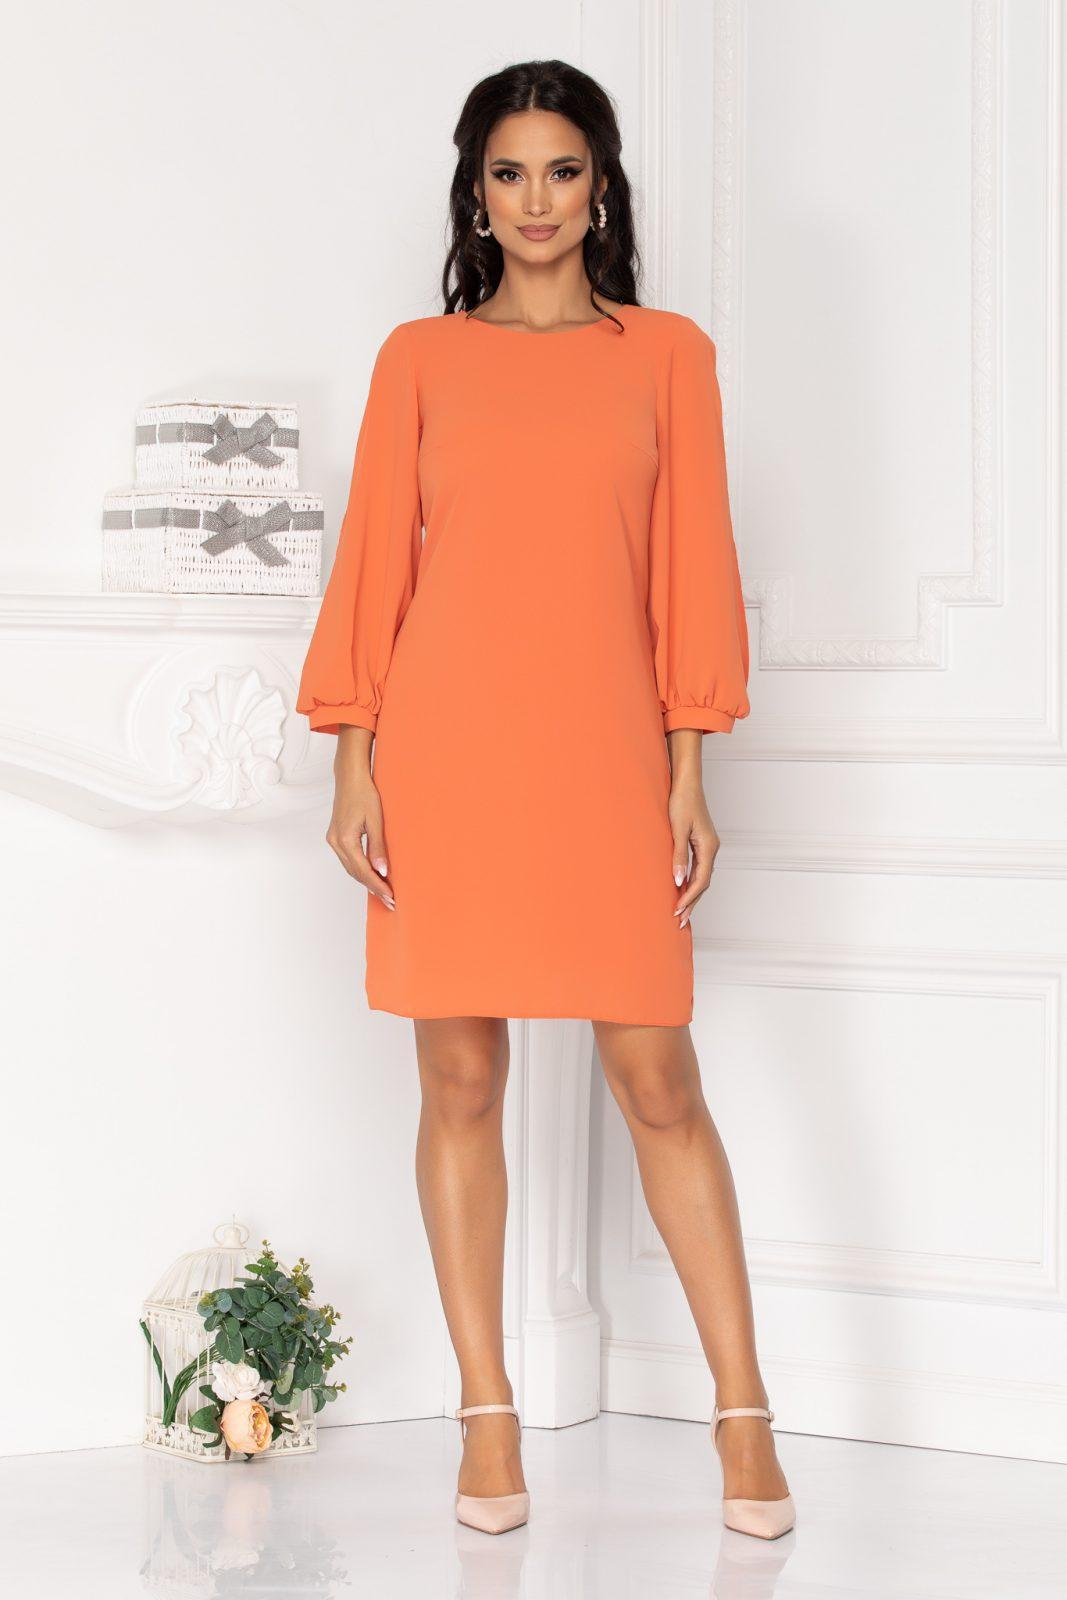 Moze Elora Orange Dress